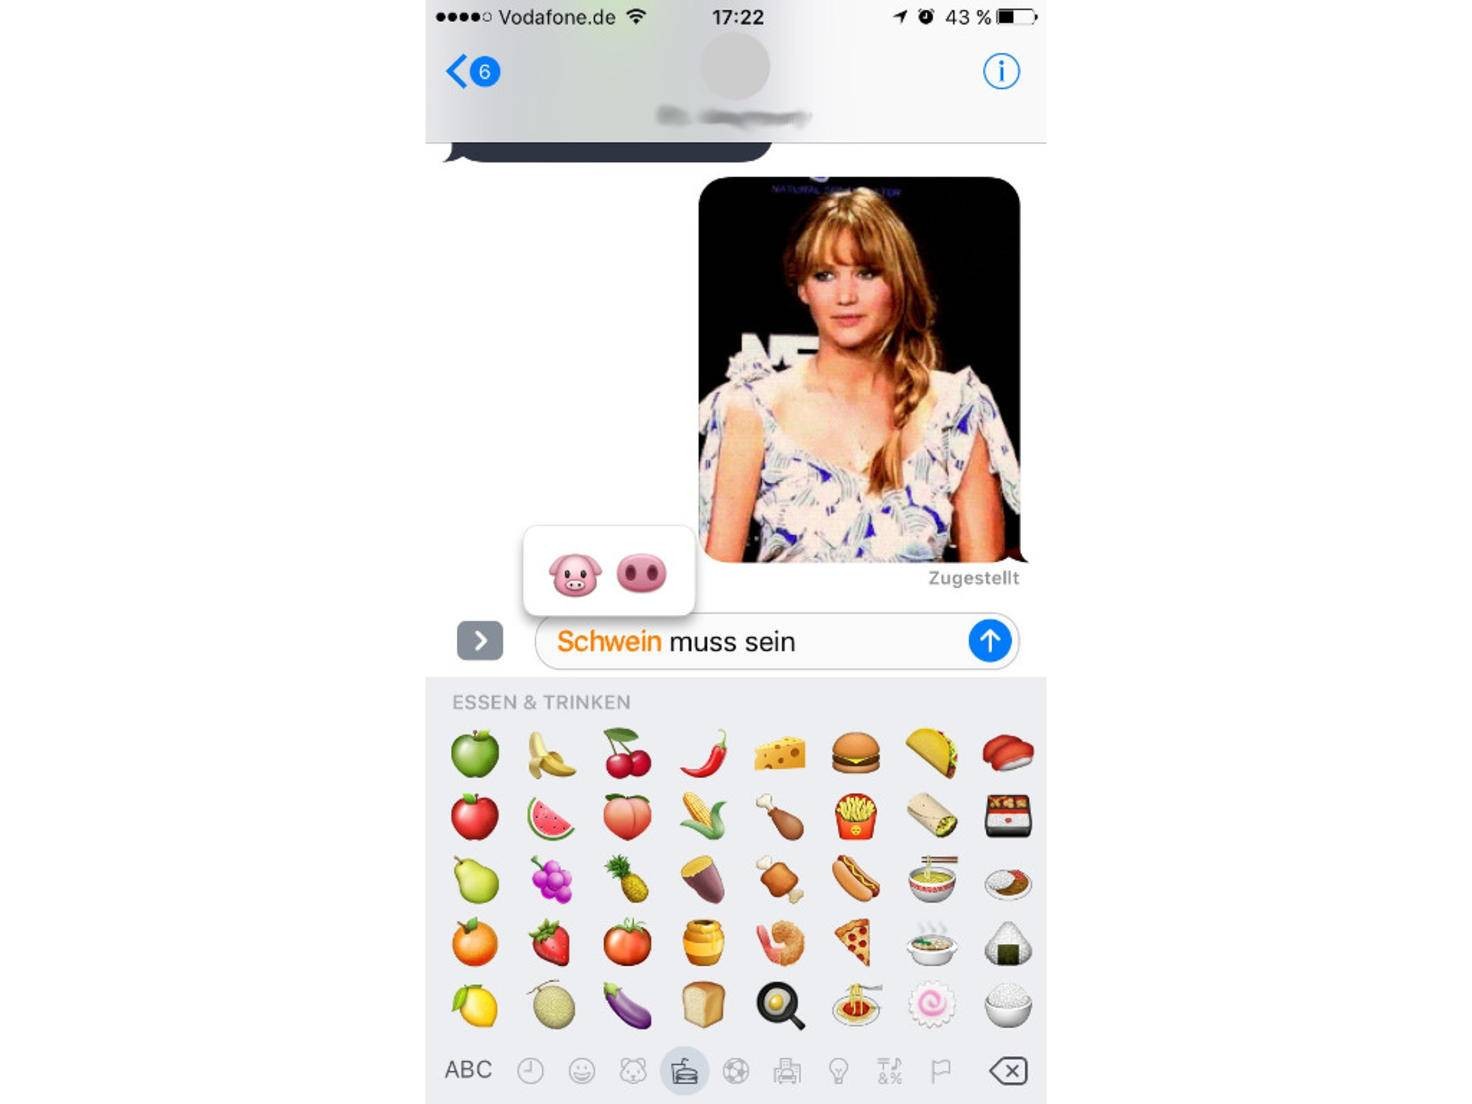 iMessage iOS 10 Emojis